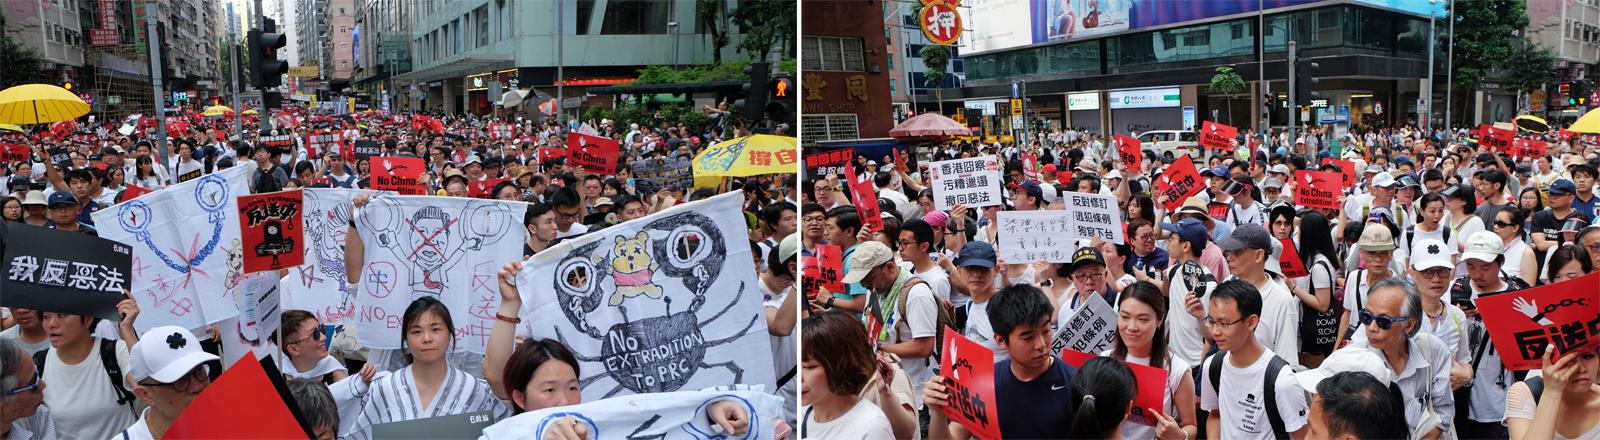 Protestierende in Hongkong am 9. Juni 2019